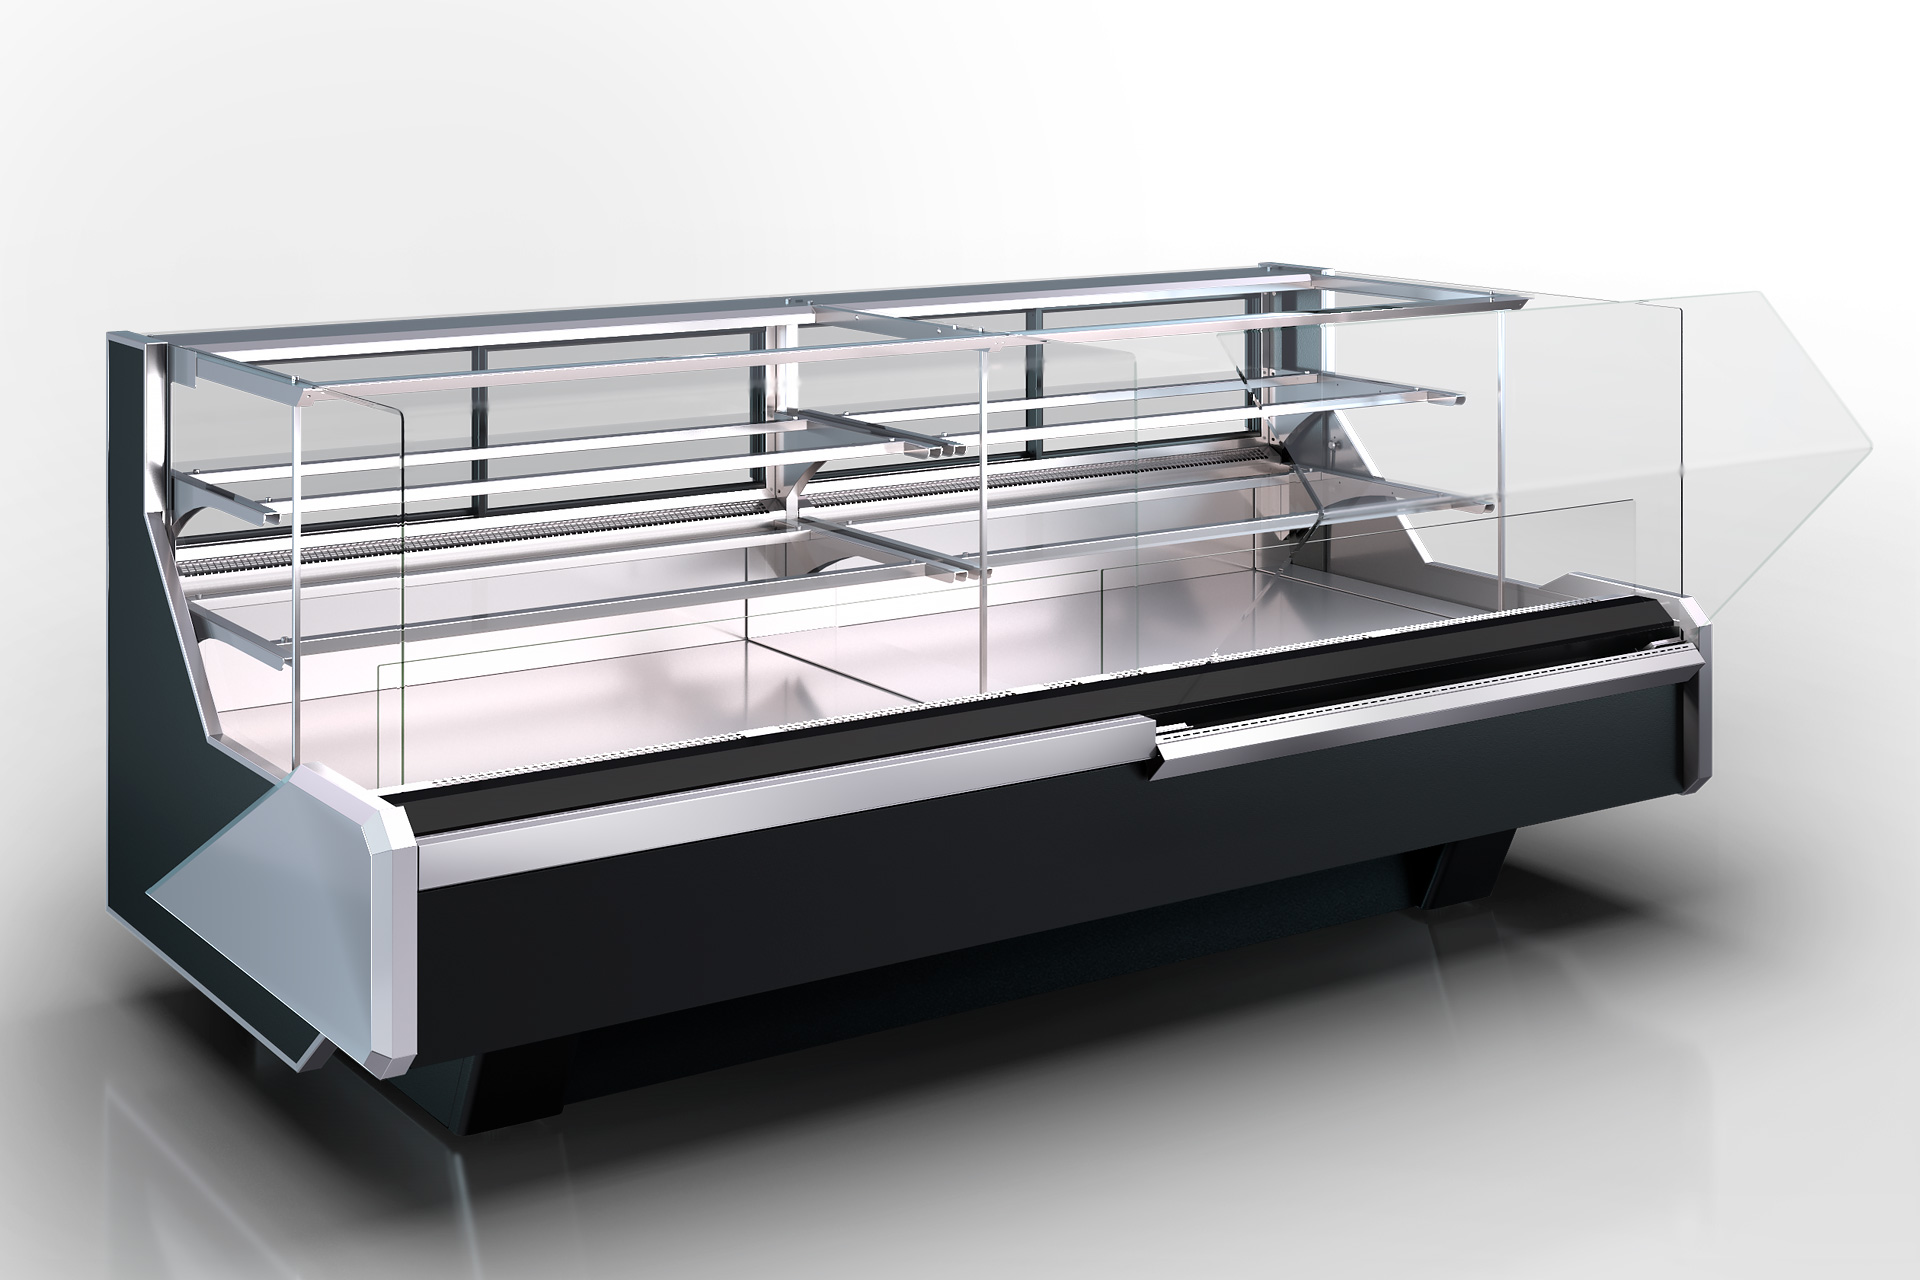 Refrigerated counters Missouri enigma MC 122 patisserie OS 115-DLM